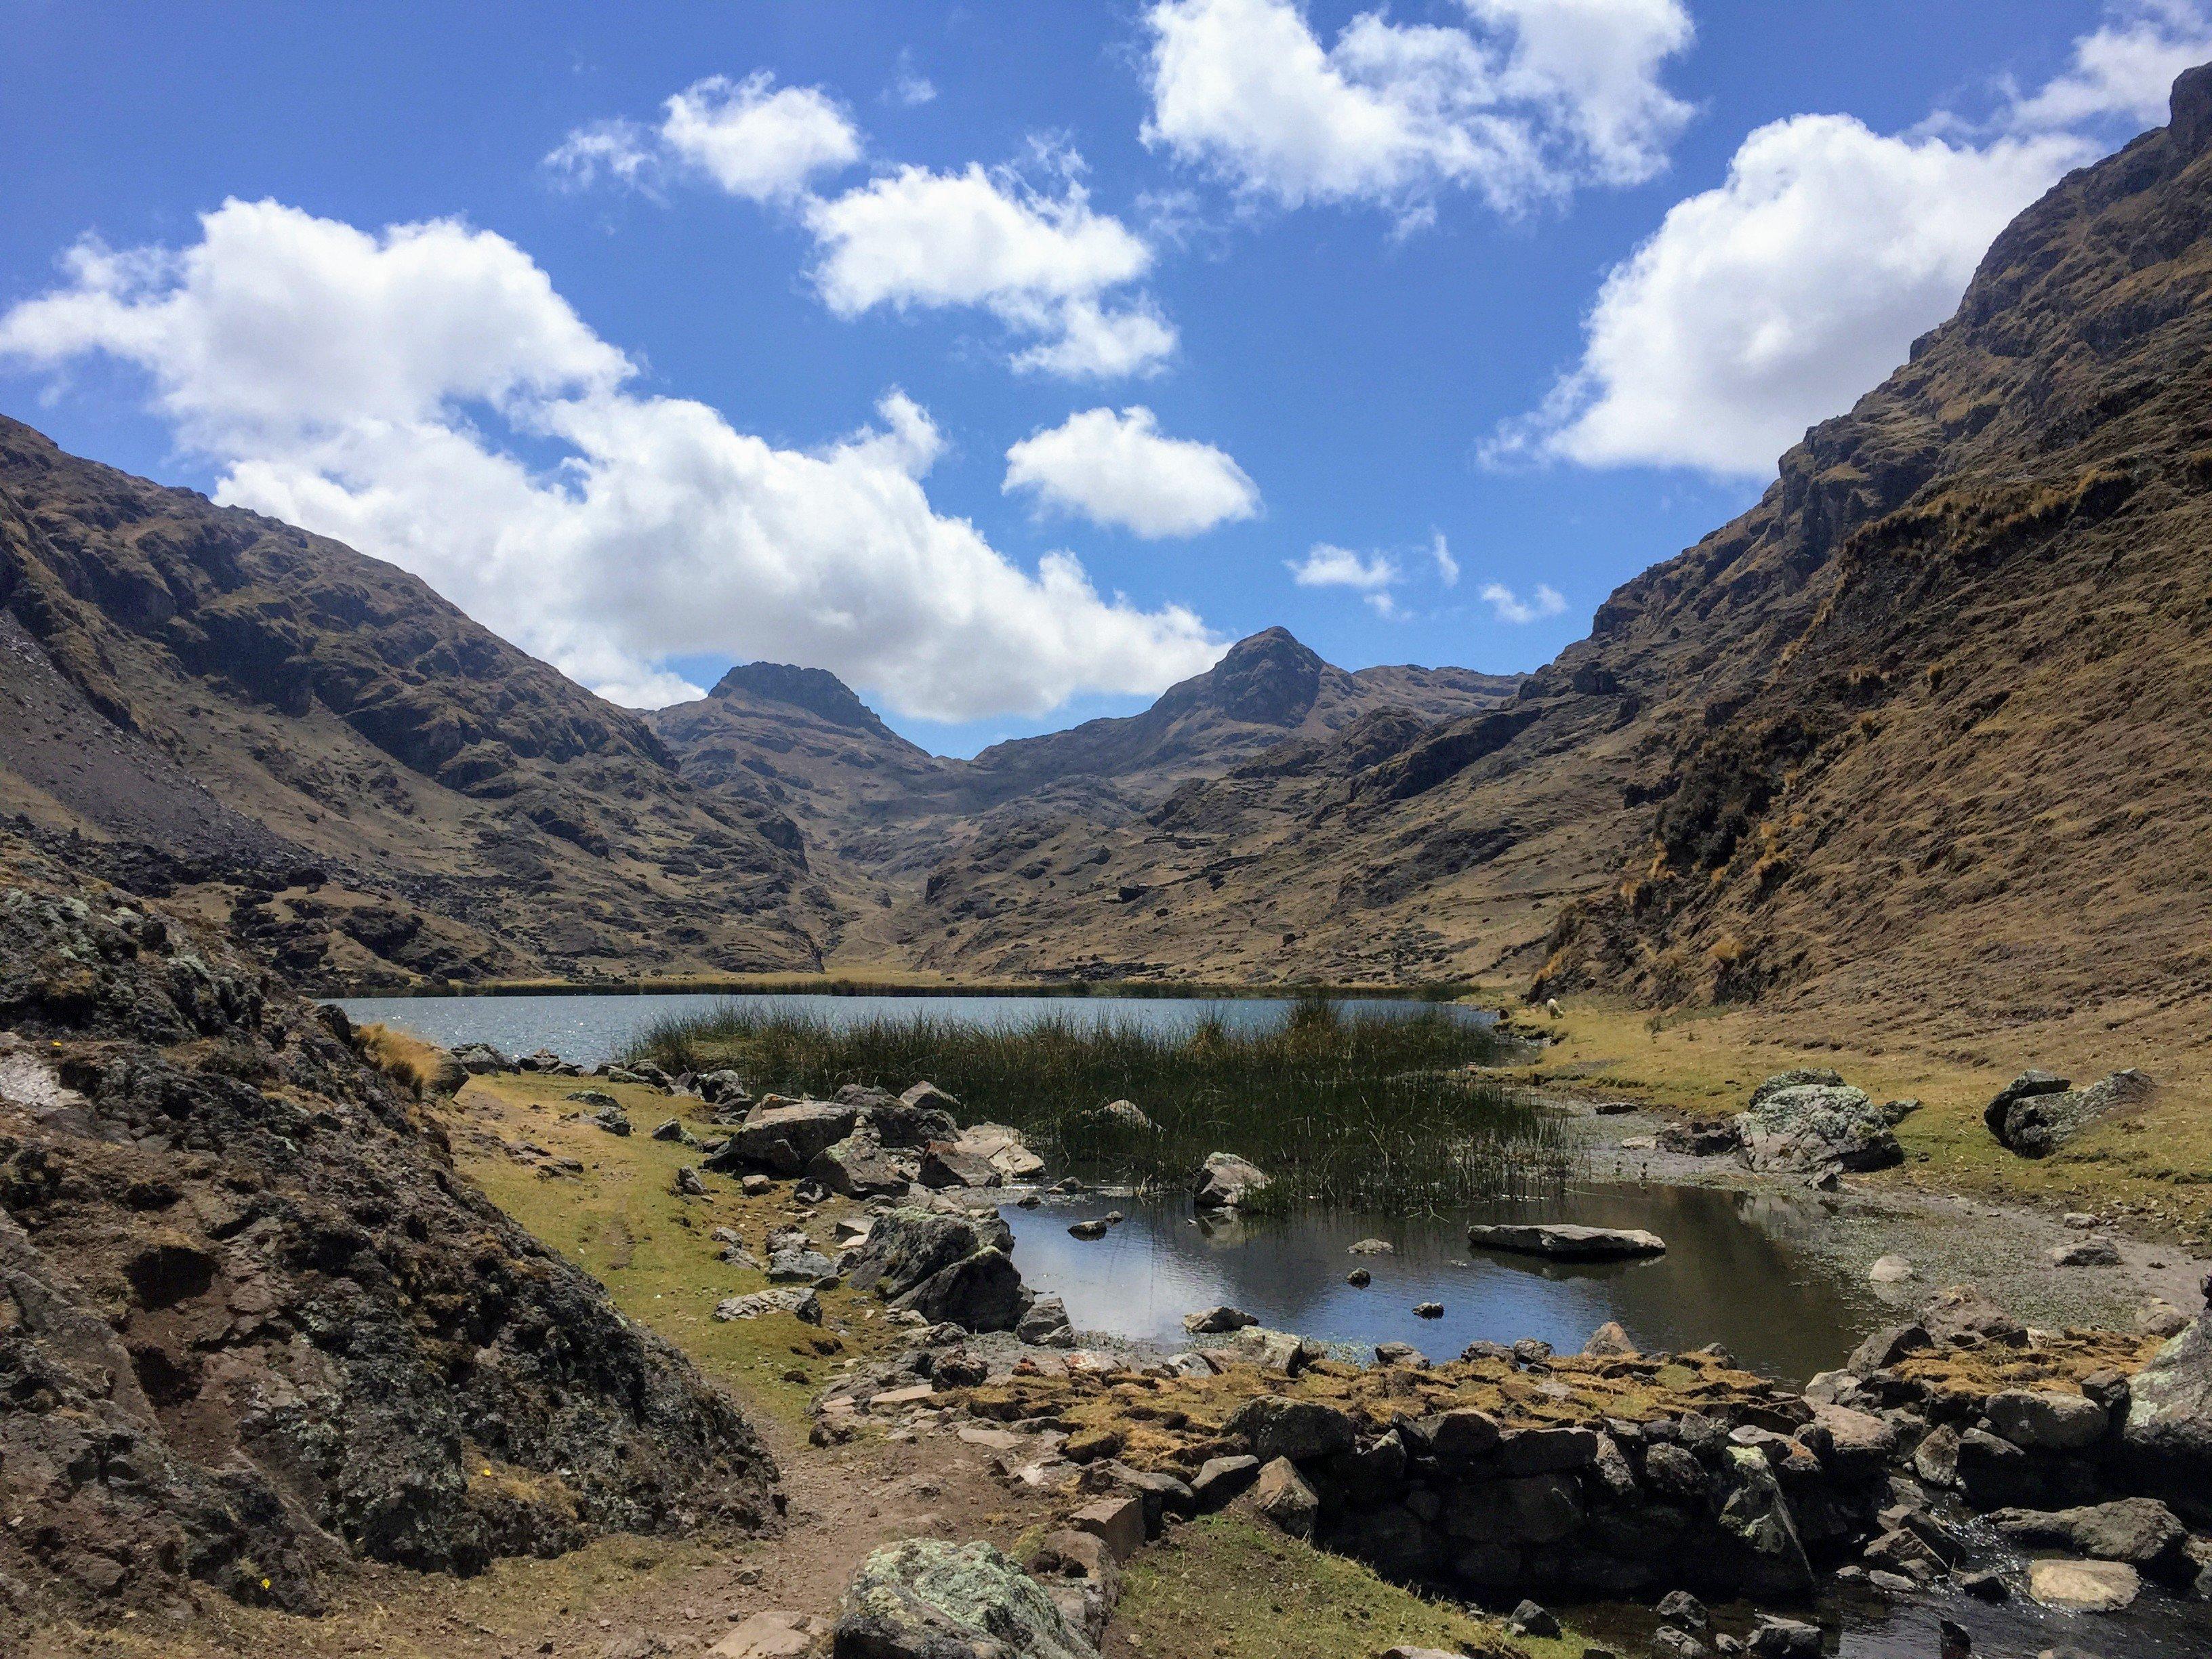 second lake on Kinsa Cocha, Pisac's three lakes hike